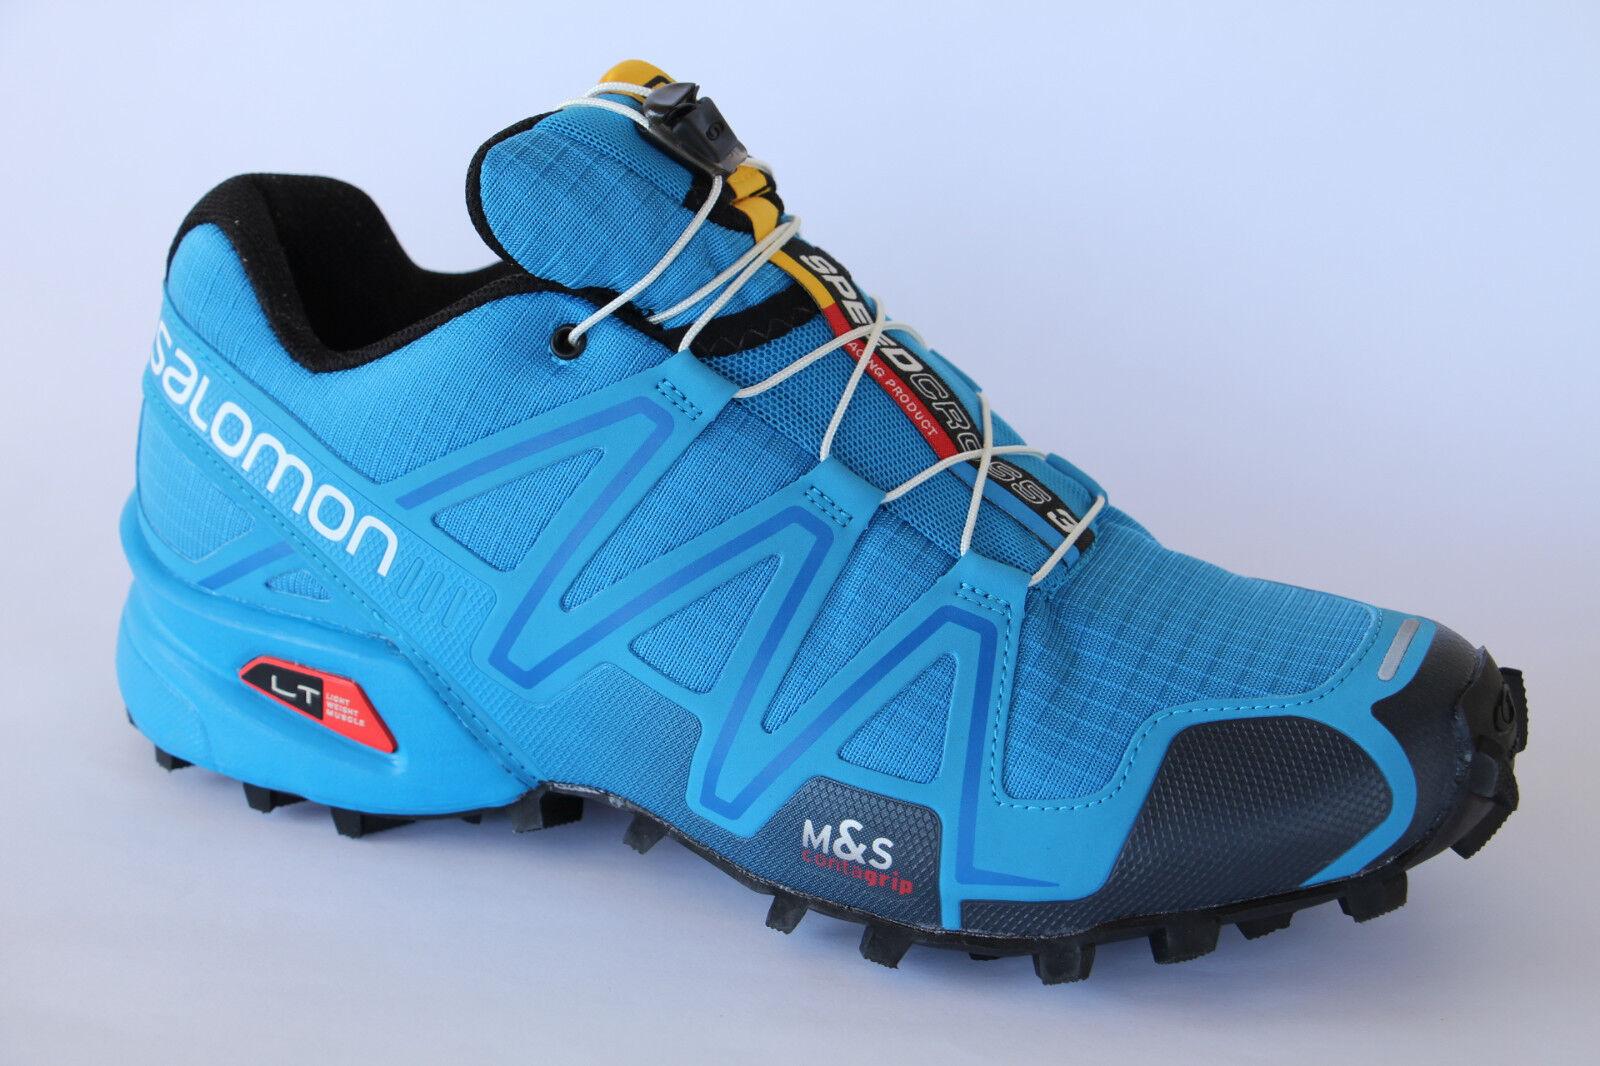 Salomon Scarpe Sportive Scarpe da Corsa Scarpe Basse Speedcross 3 Blu Nuovo